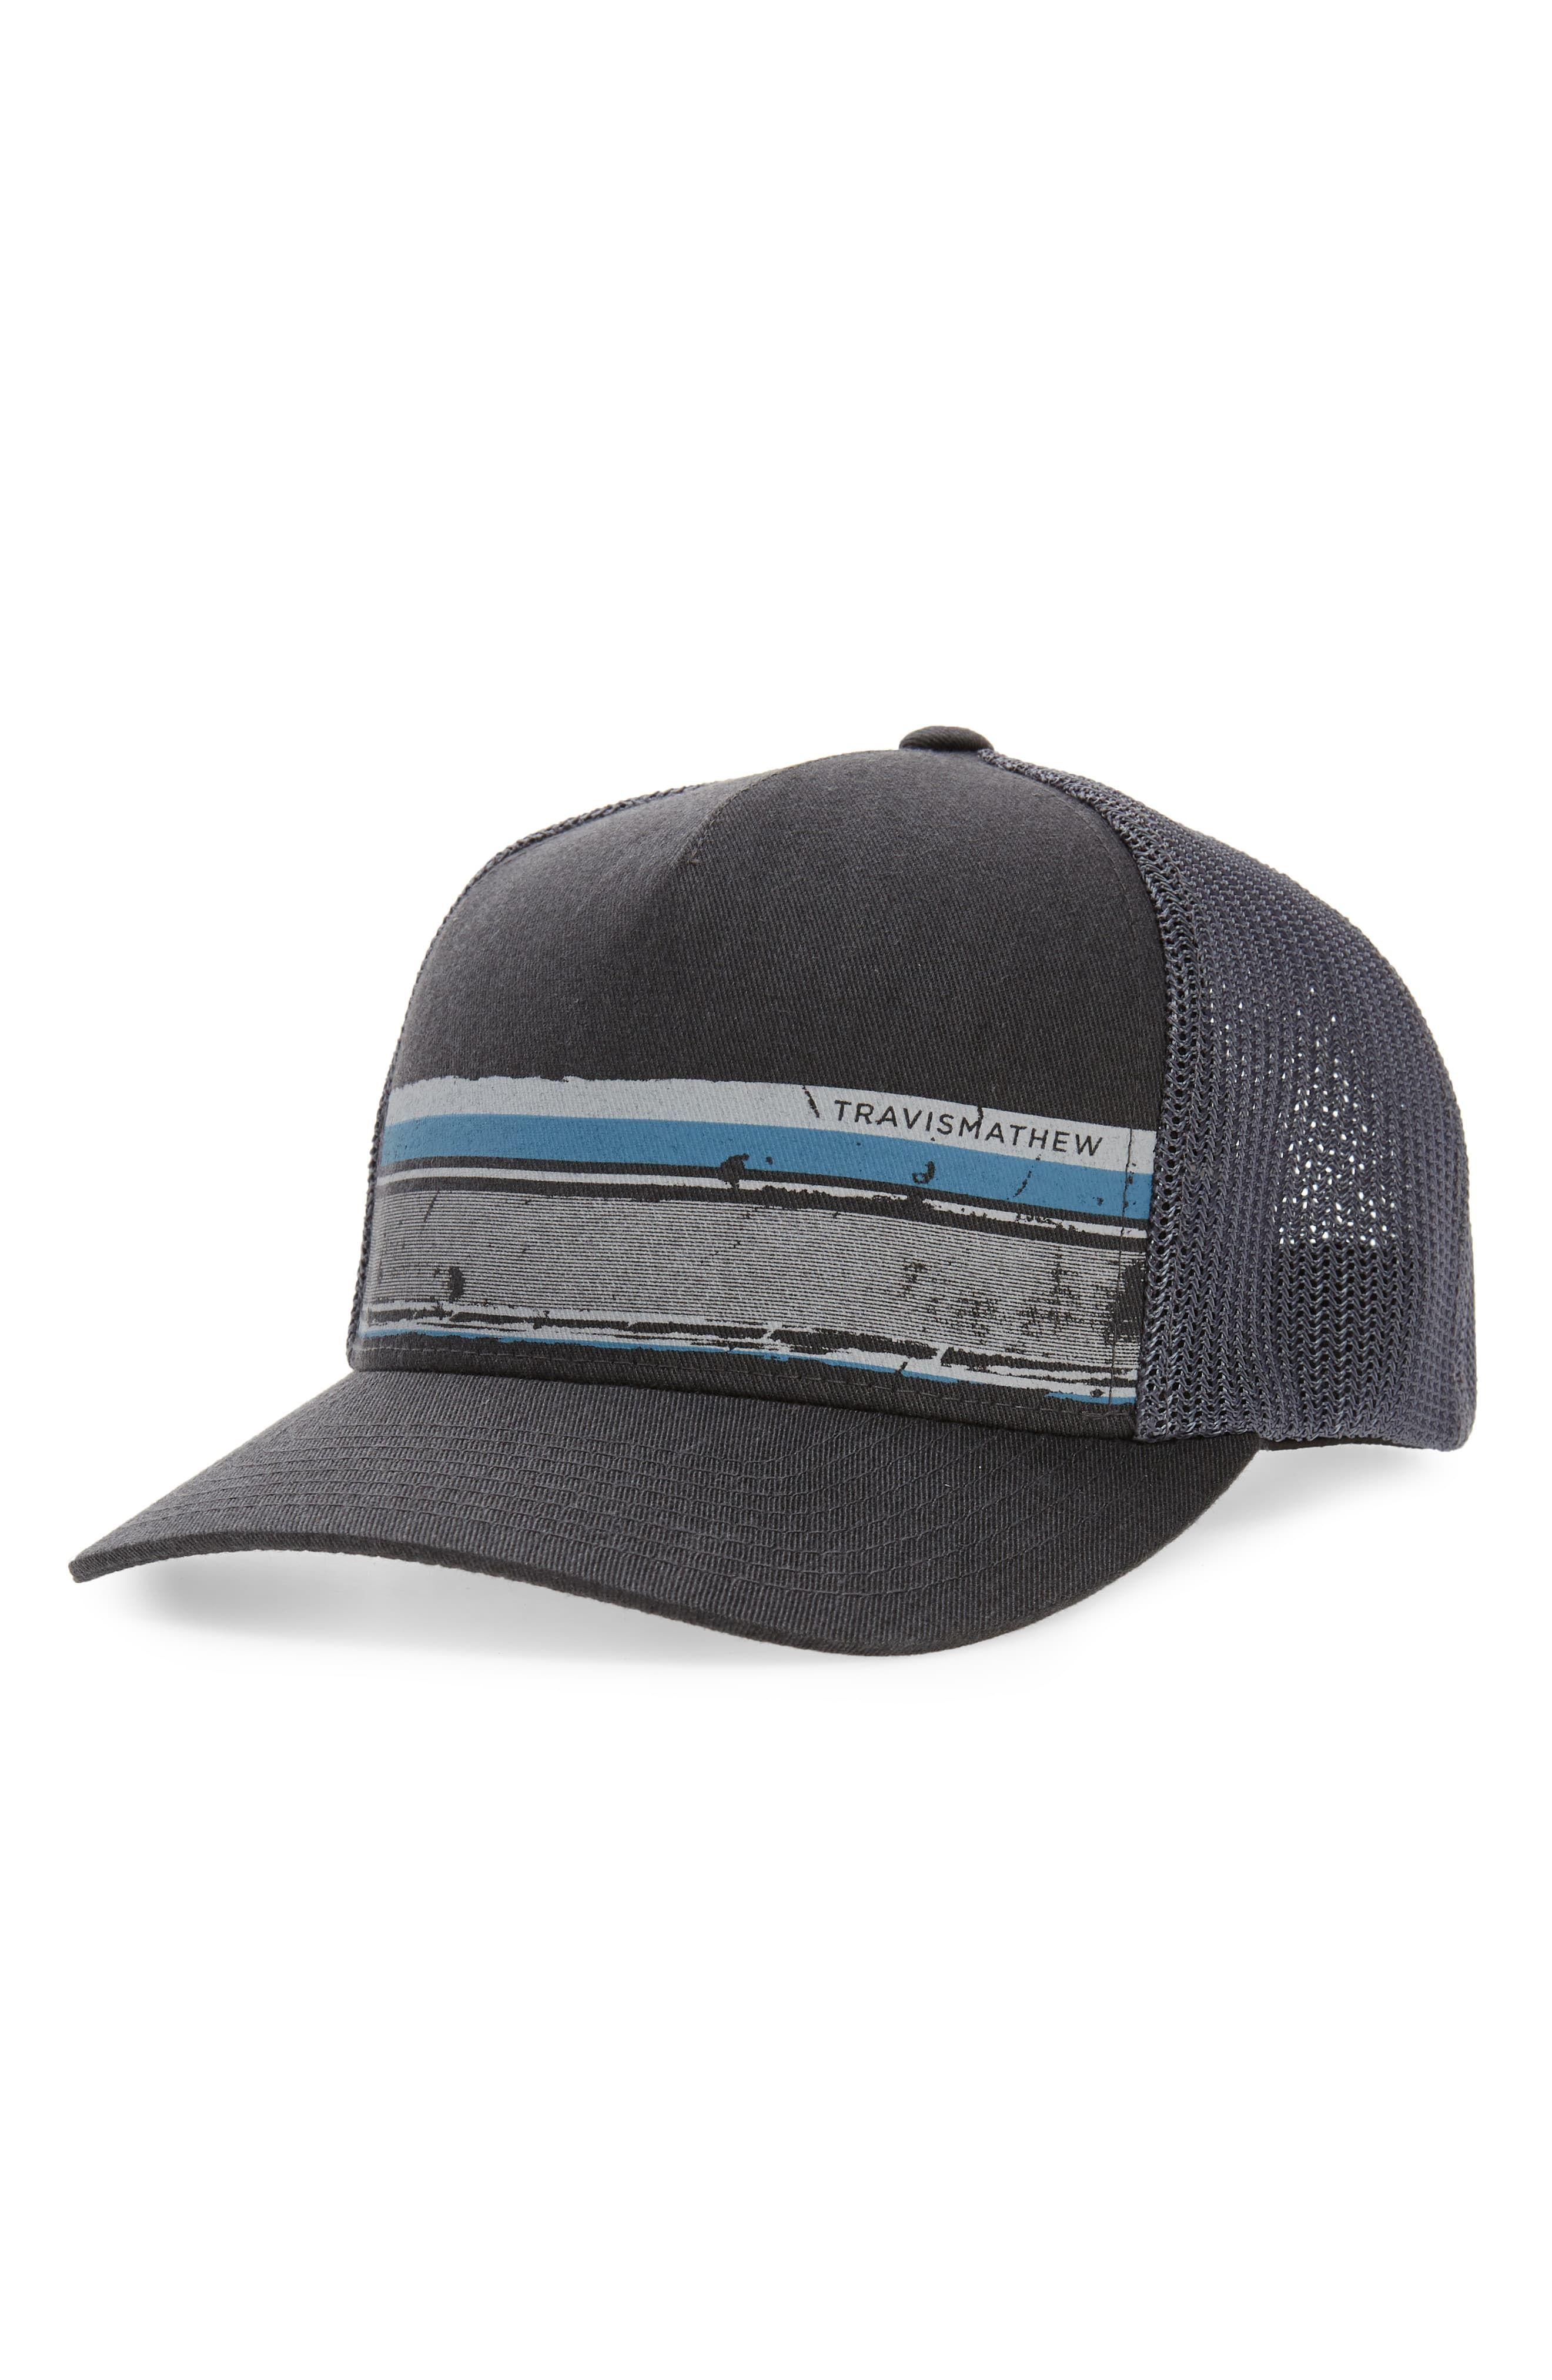 c609cb515 Men's Travismathew Painter Trucker Hat, Size Large/X-Large - Grey in ...